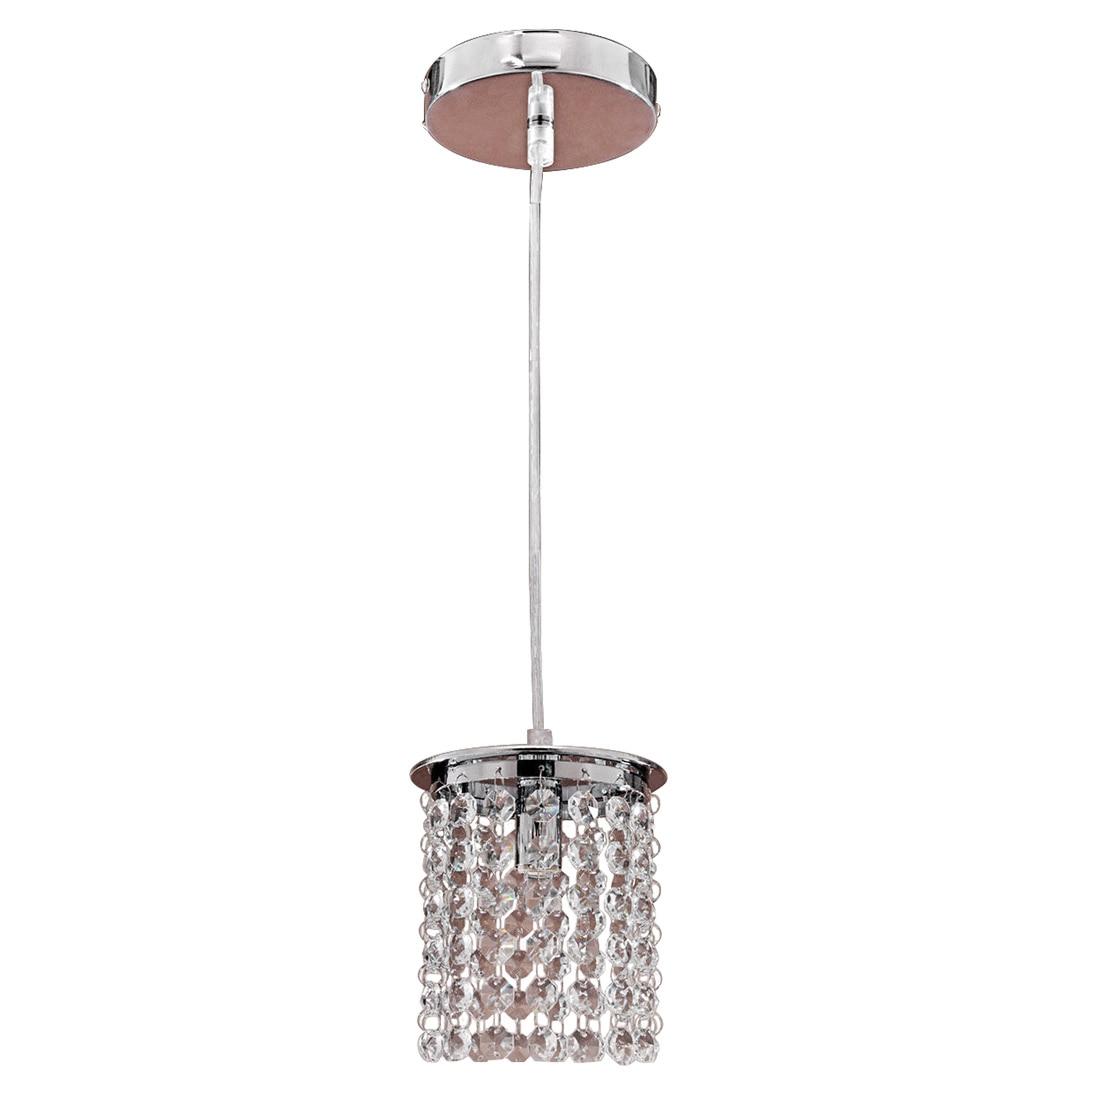 Crystal Modern Chandelier Pendant Kitchen Dining Room Fixture Ligh